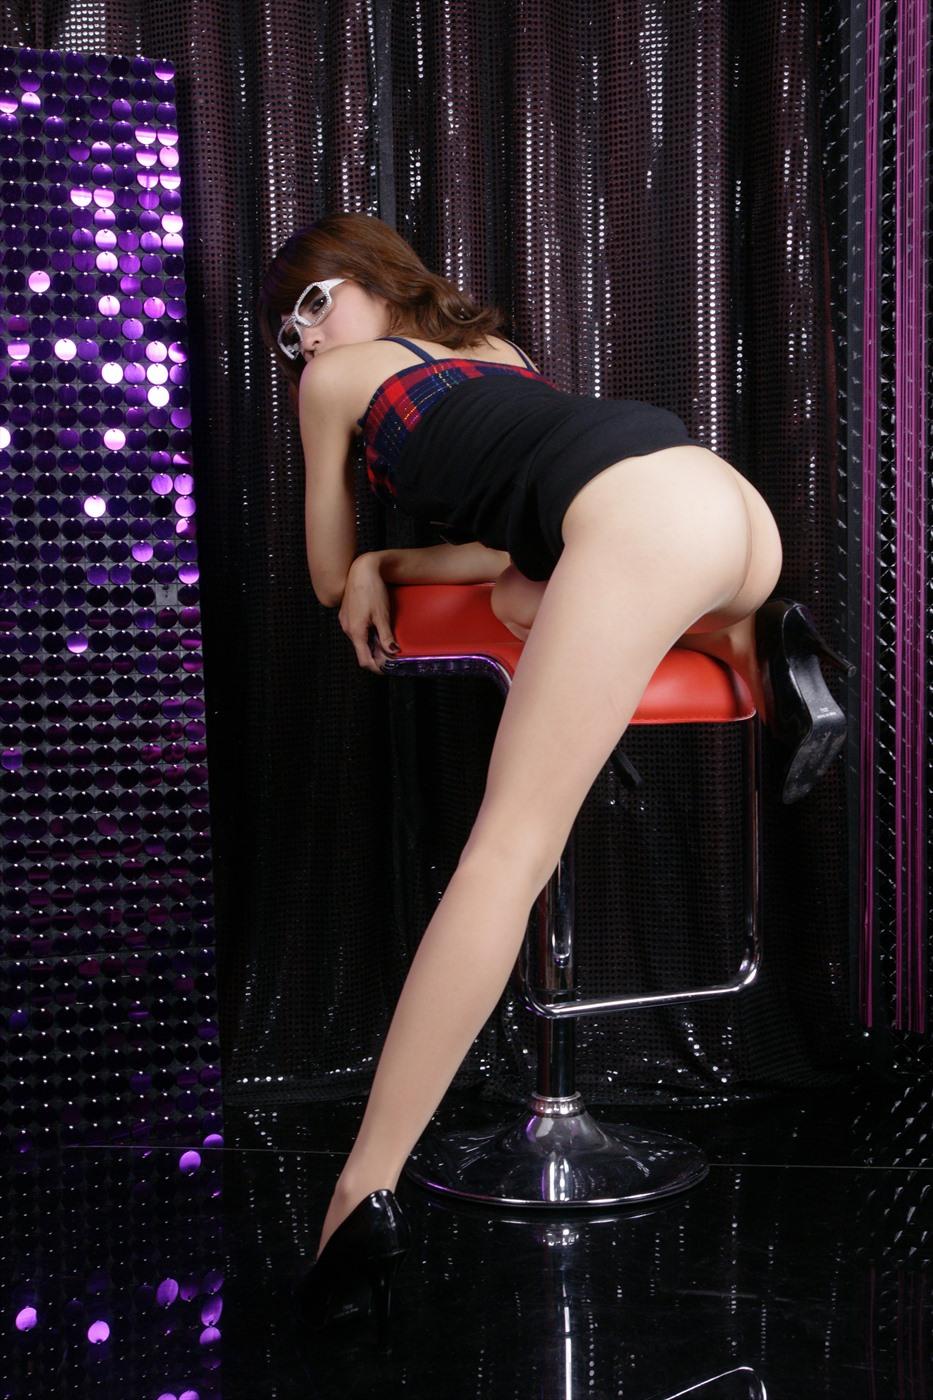 IMG 0221 - 82 Taiwan Model Jieli Juicy Pussy